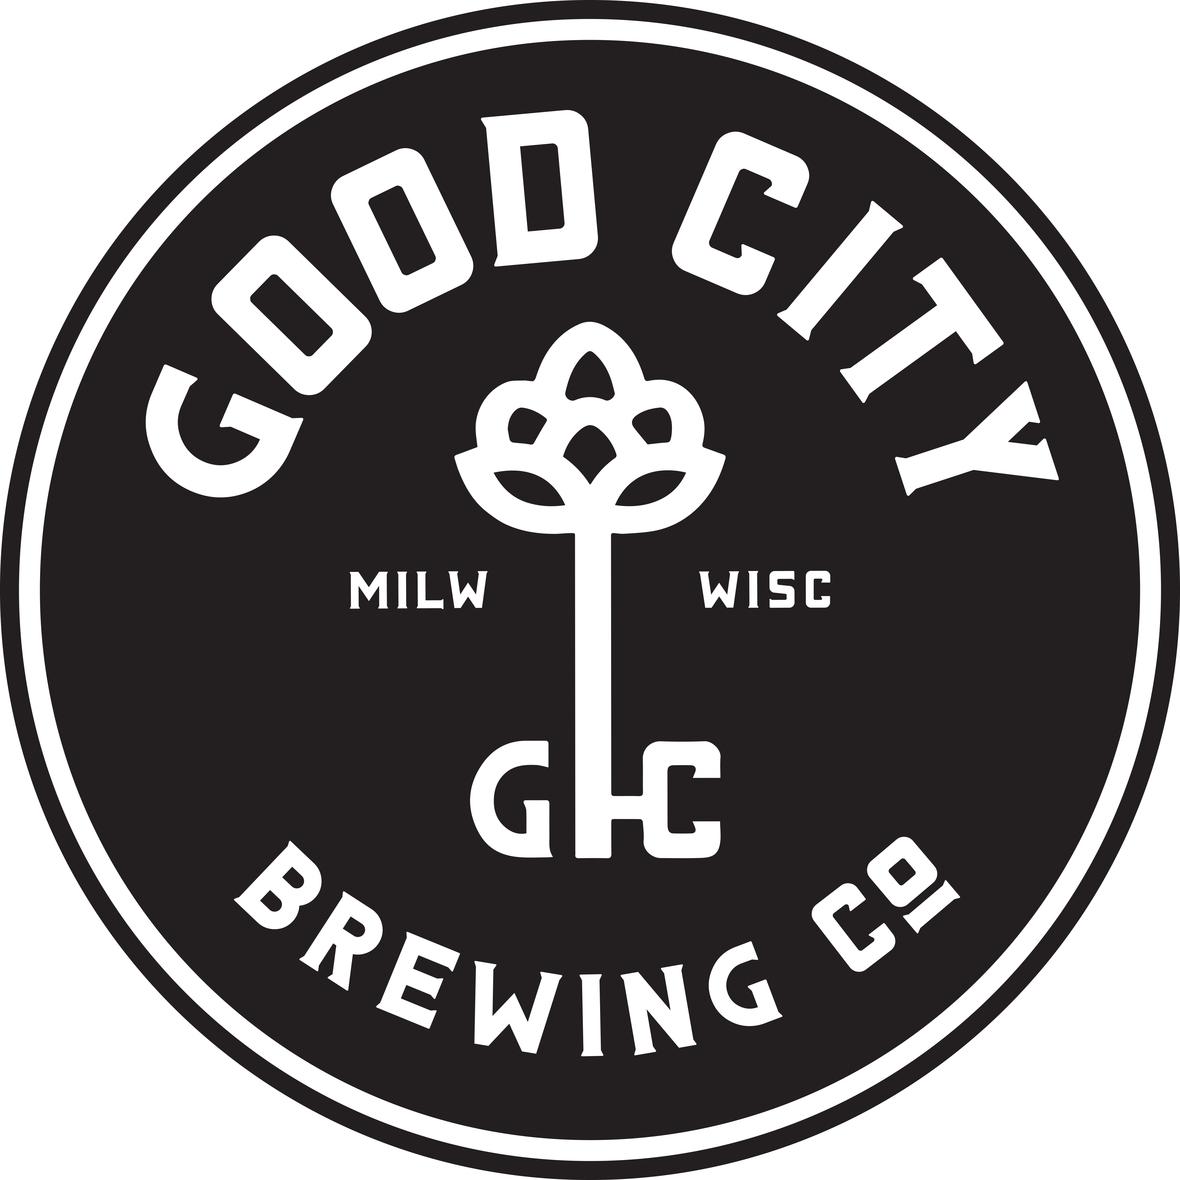 goodcity logo circle 04  2